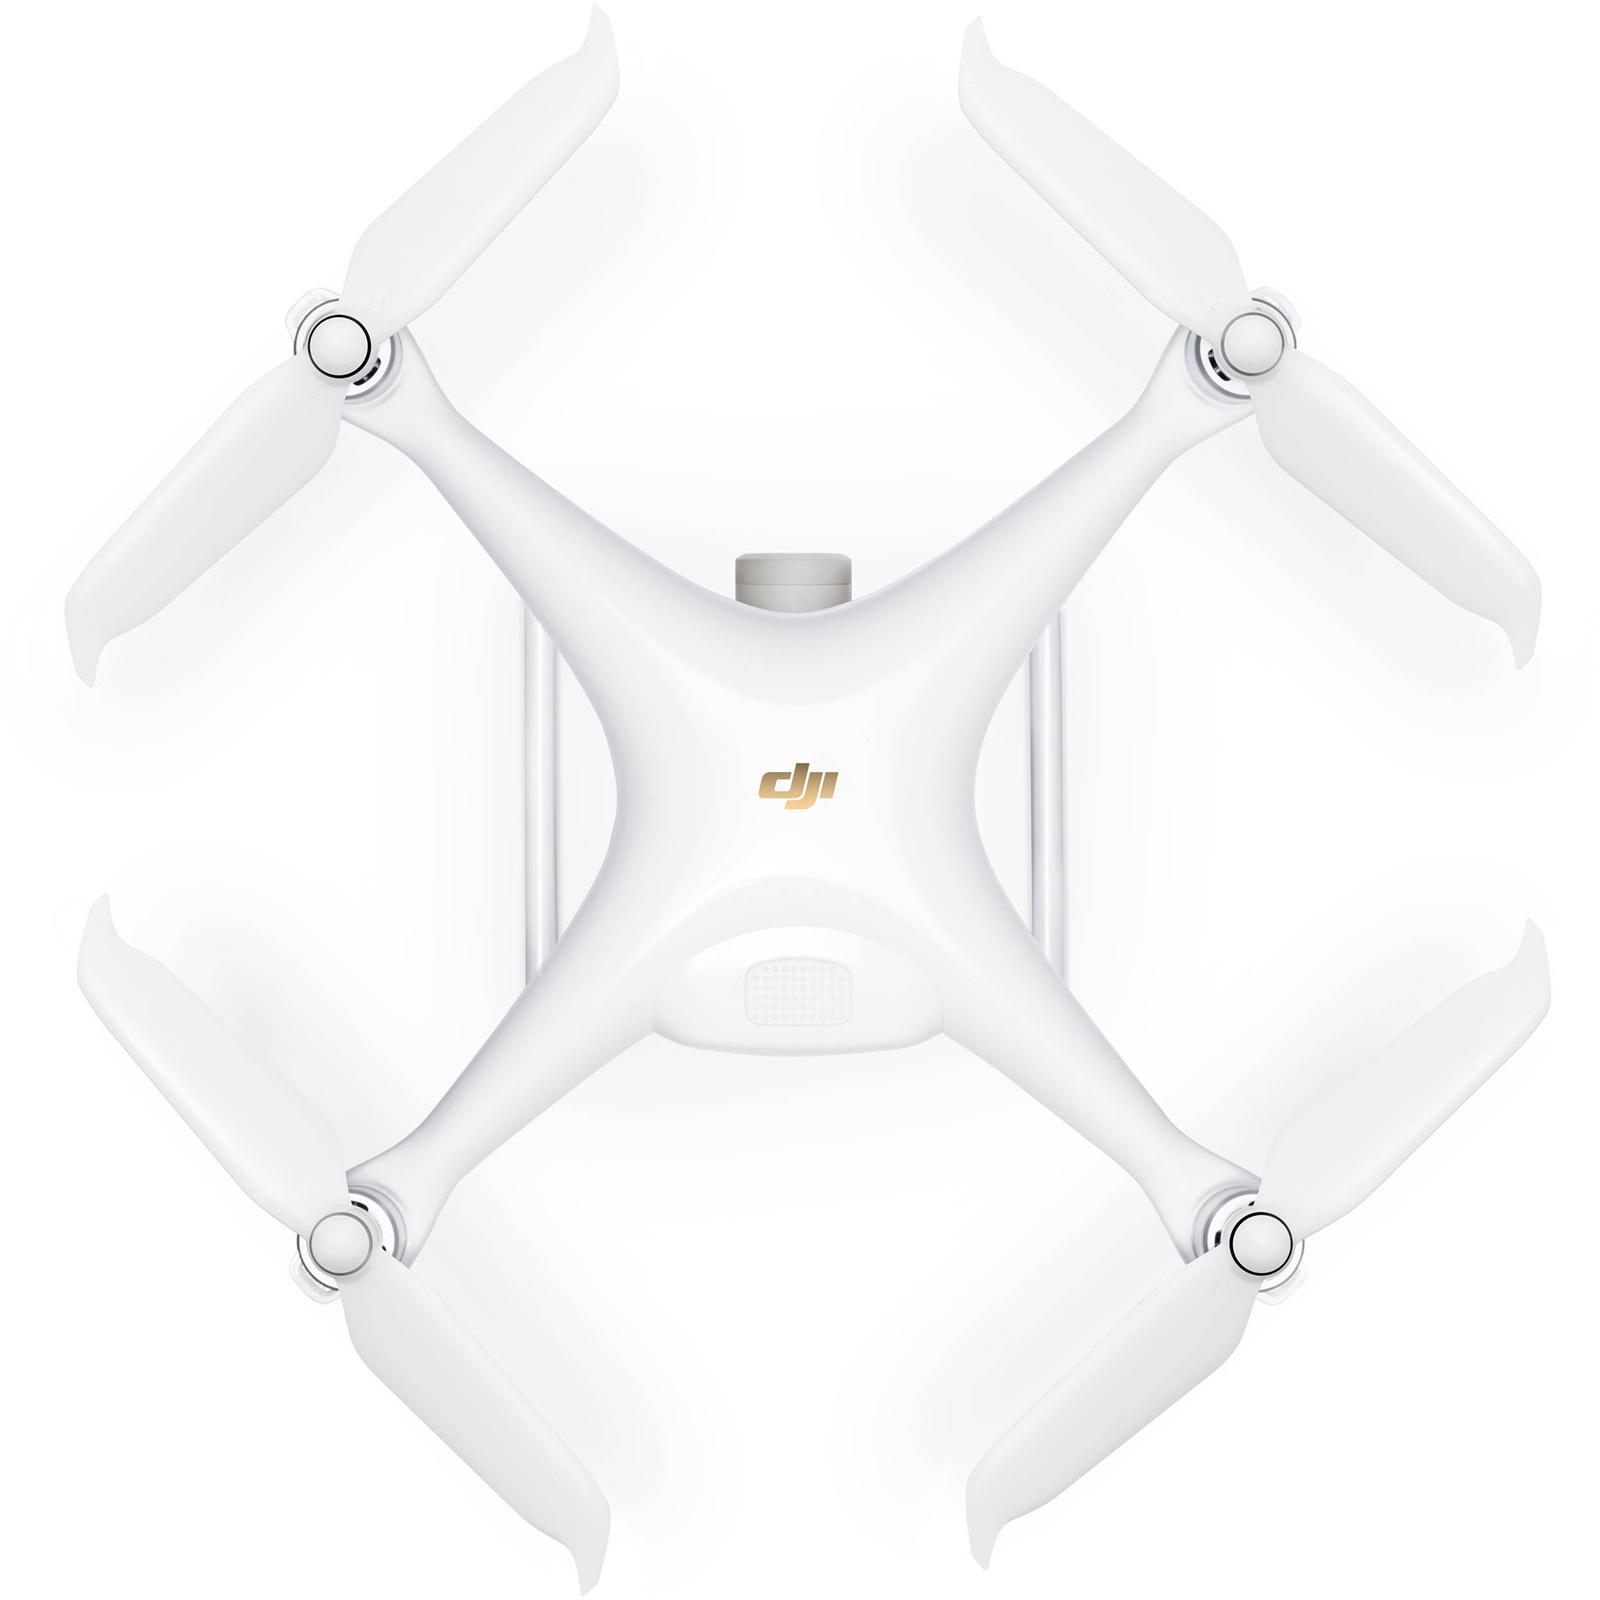 Buy the DJI Phantom 4 Pro+ V2 0 Drone with Gimbal-stabilised